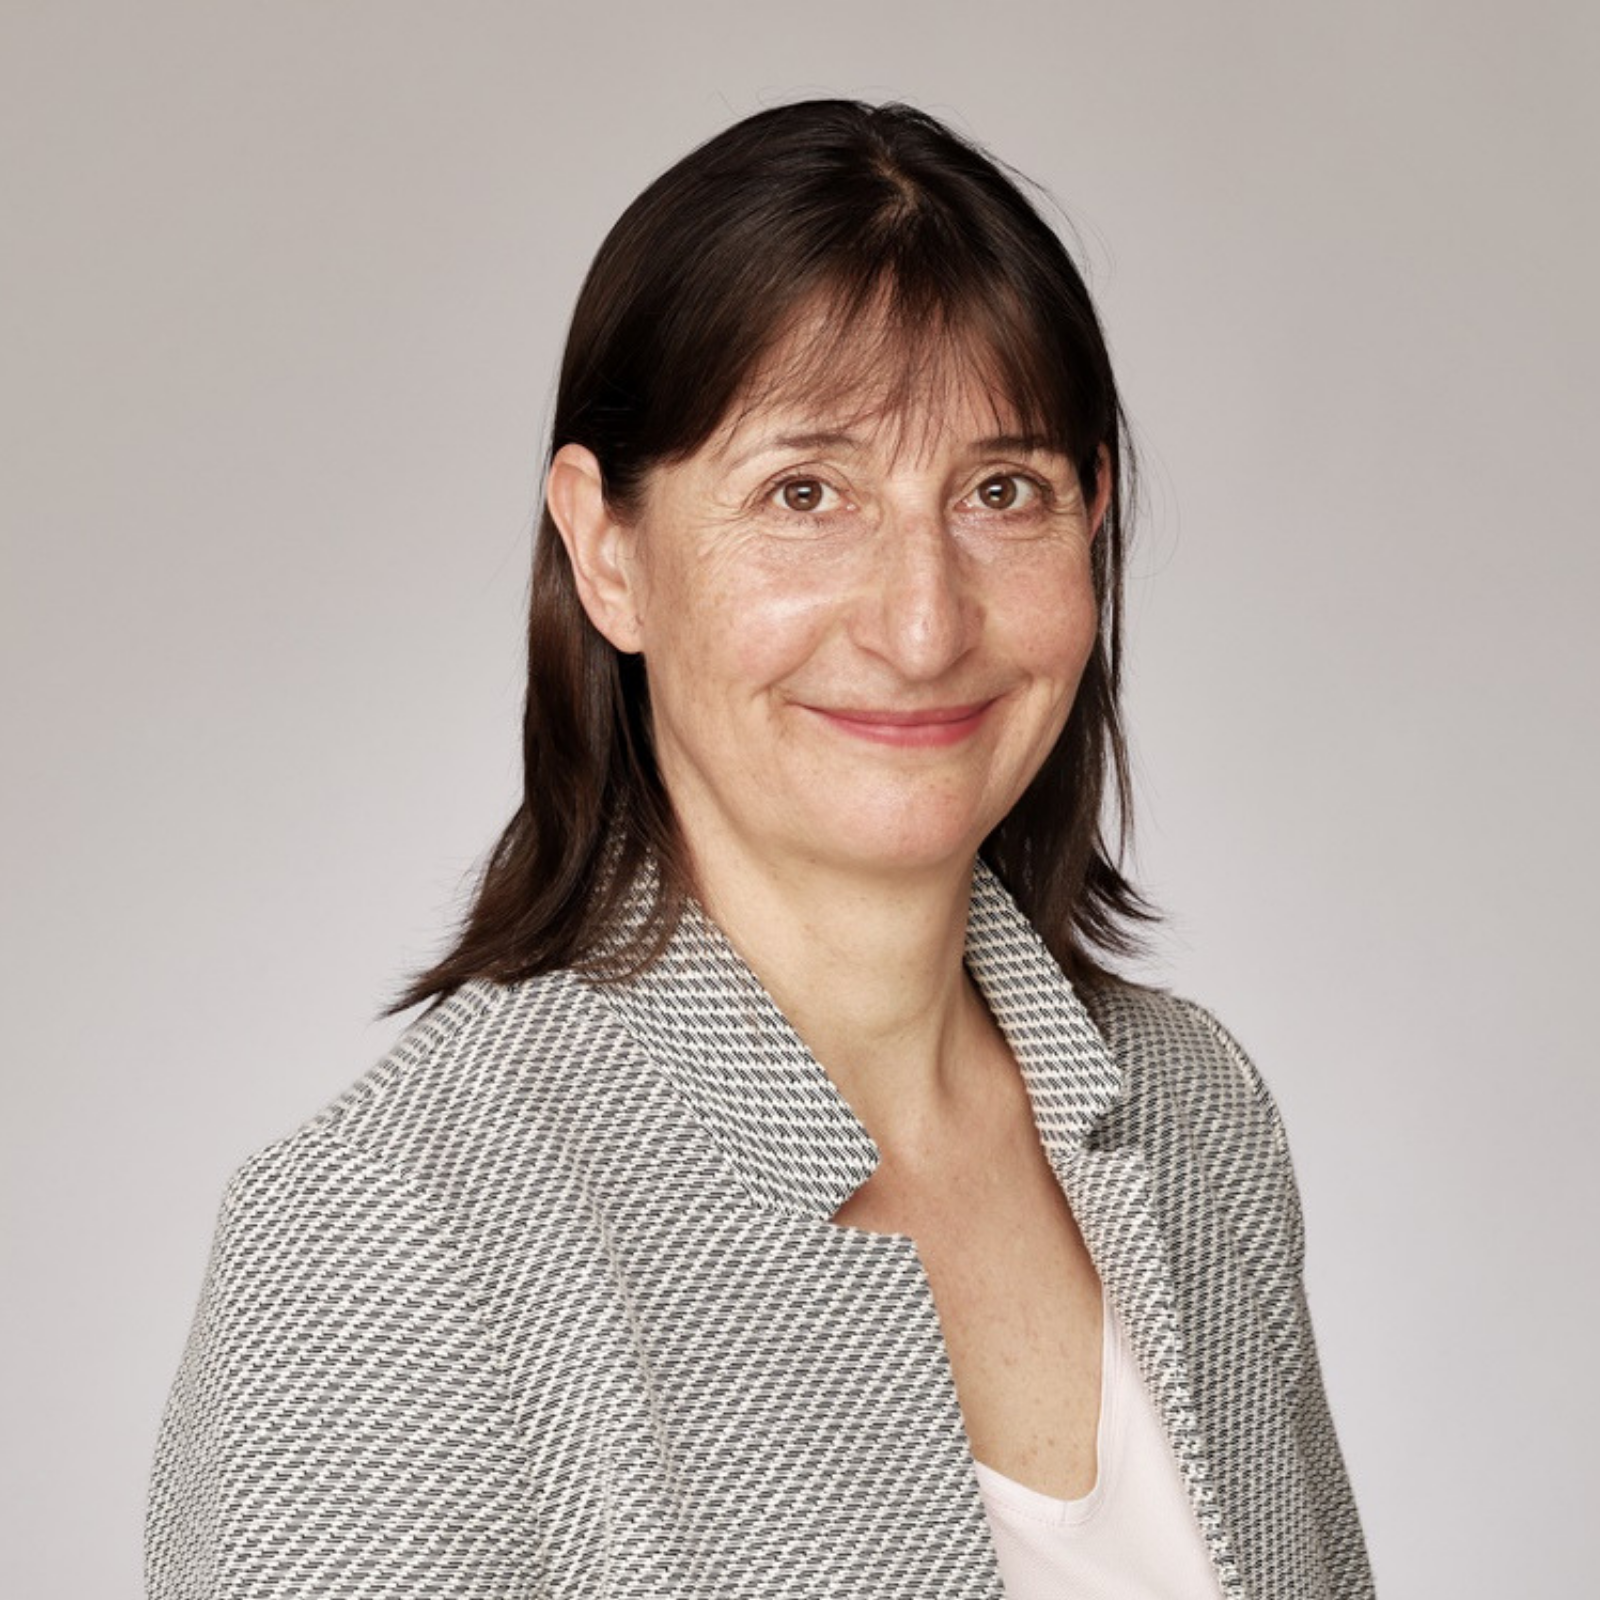 Danielle Bernath